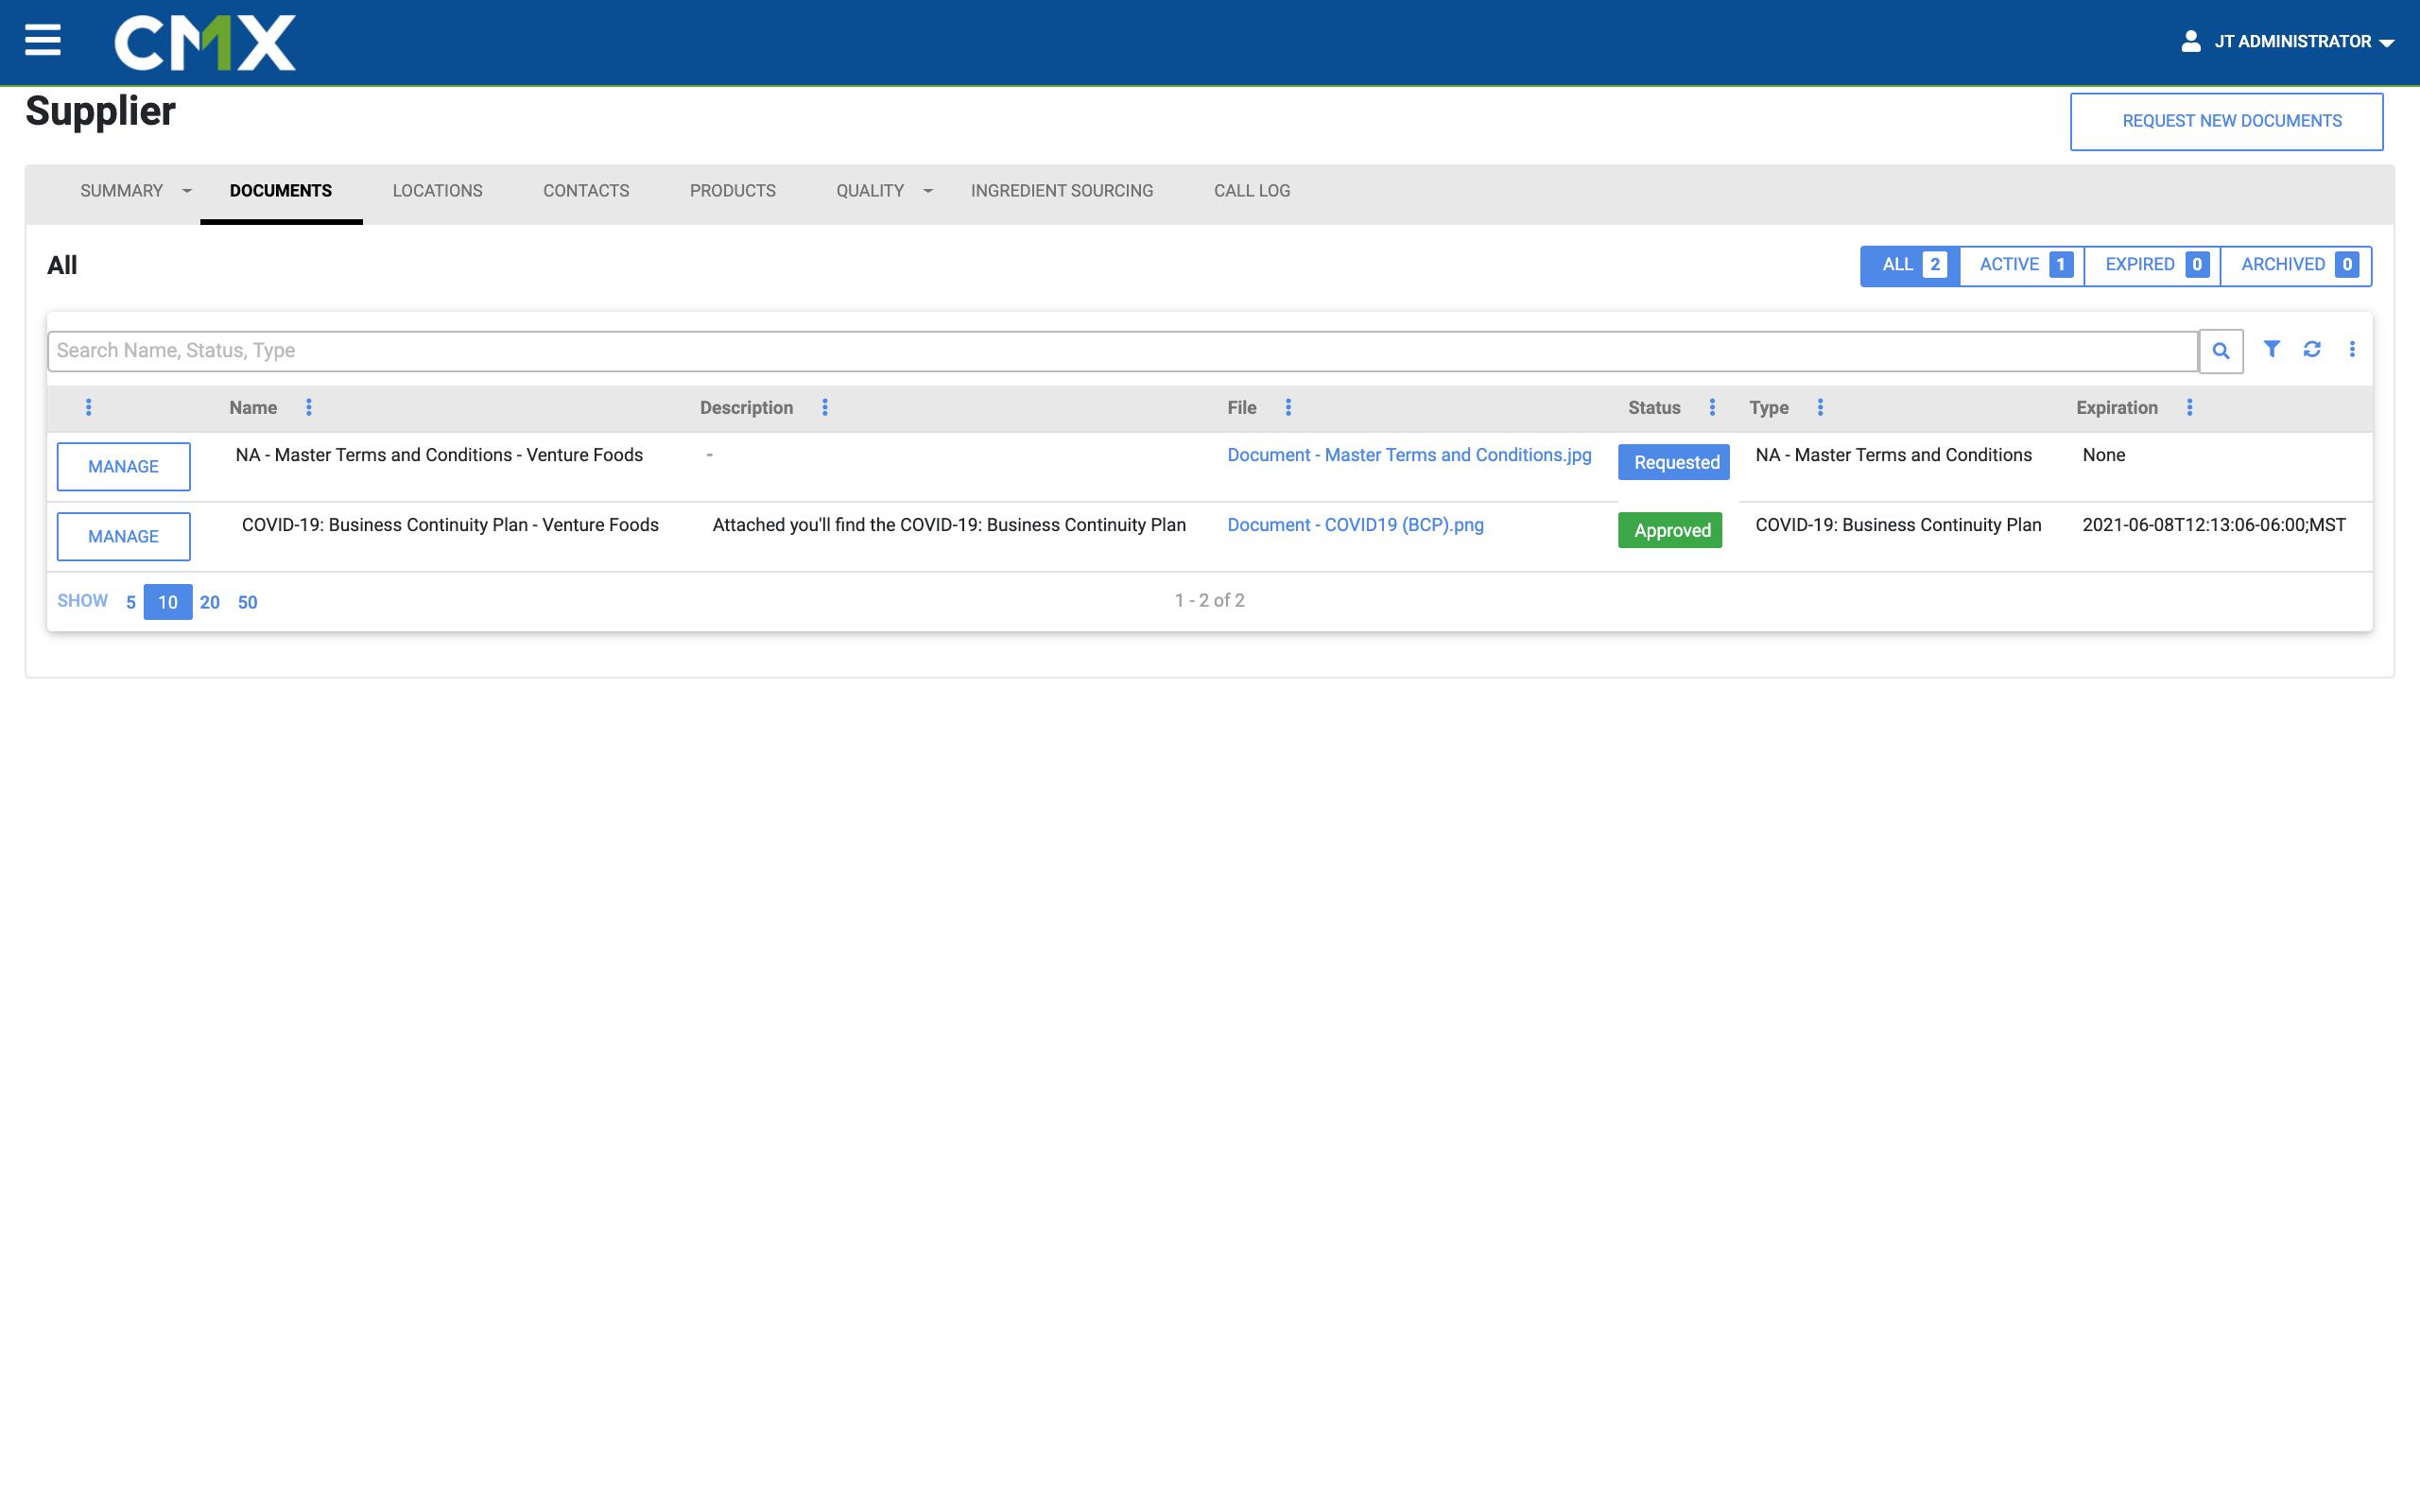 Document Management Supplier View